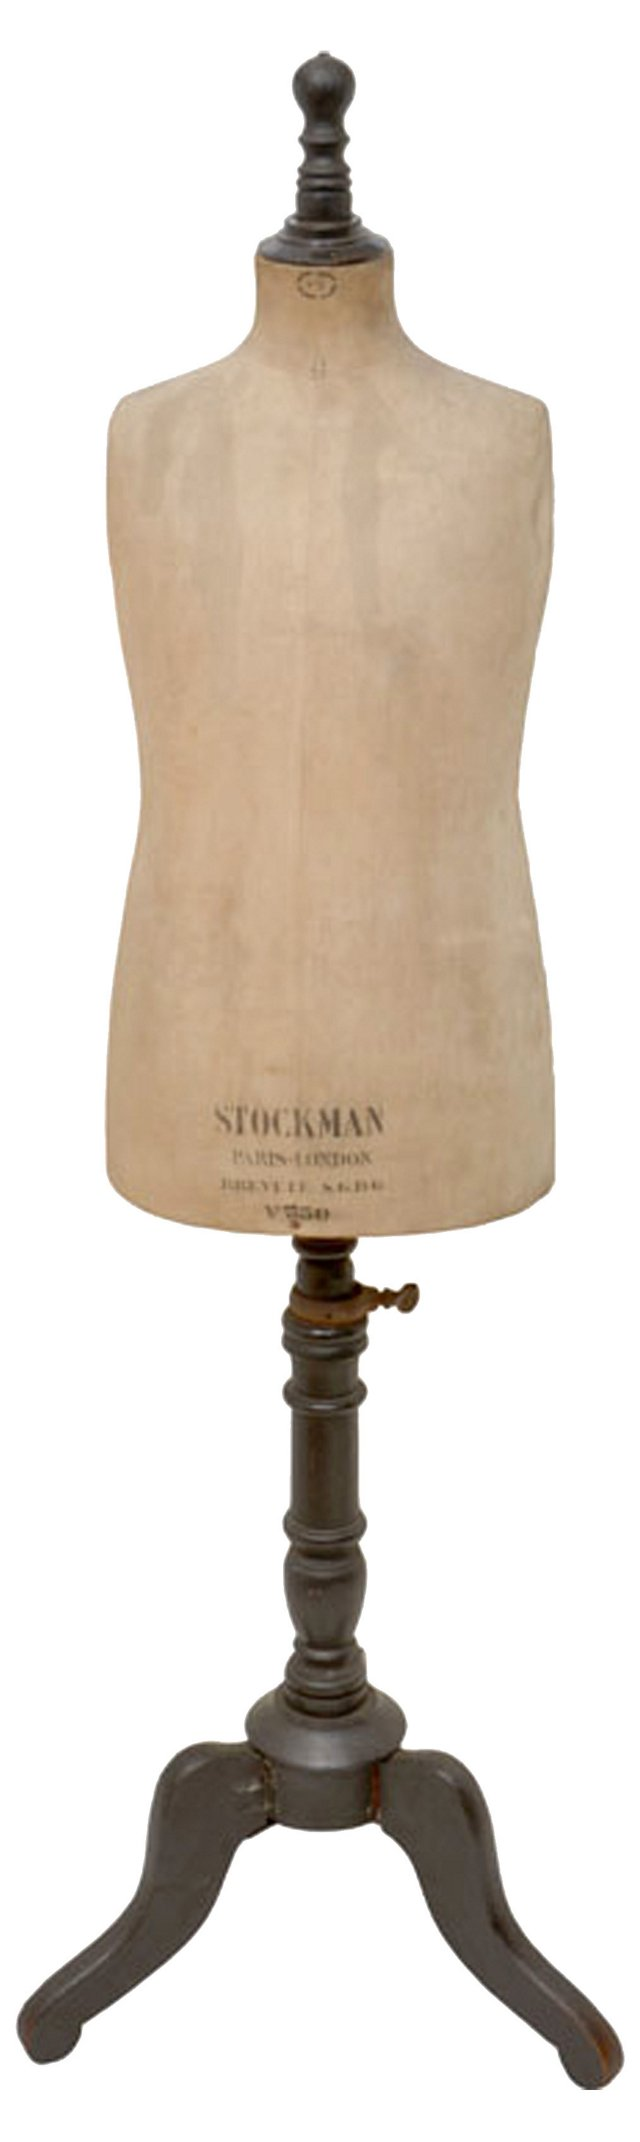 Antique Stockman Child's Tailor Dummy